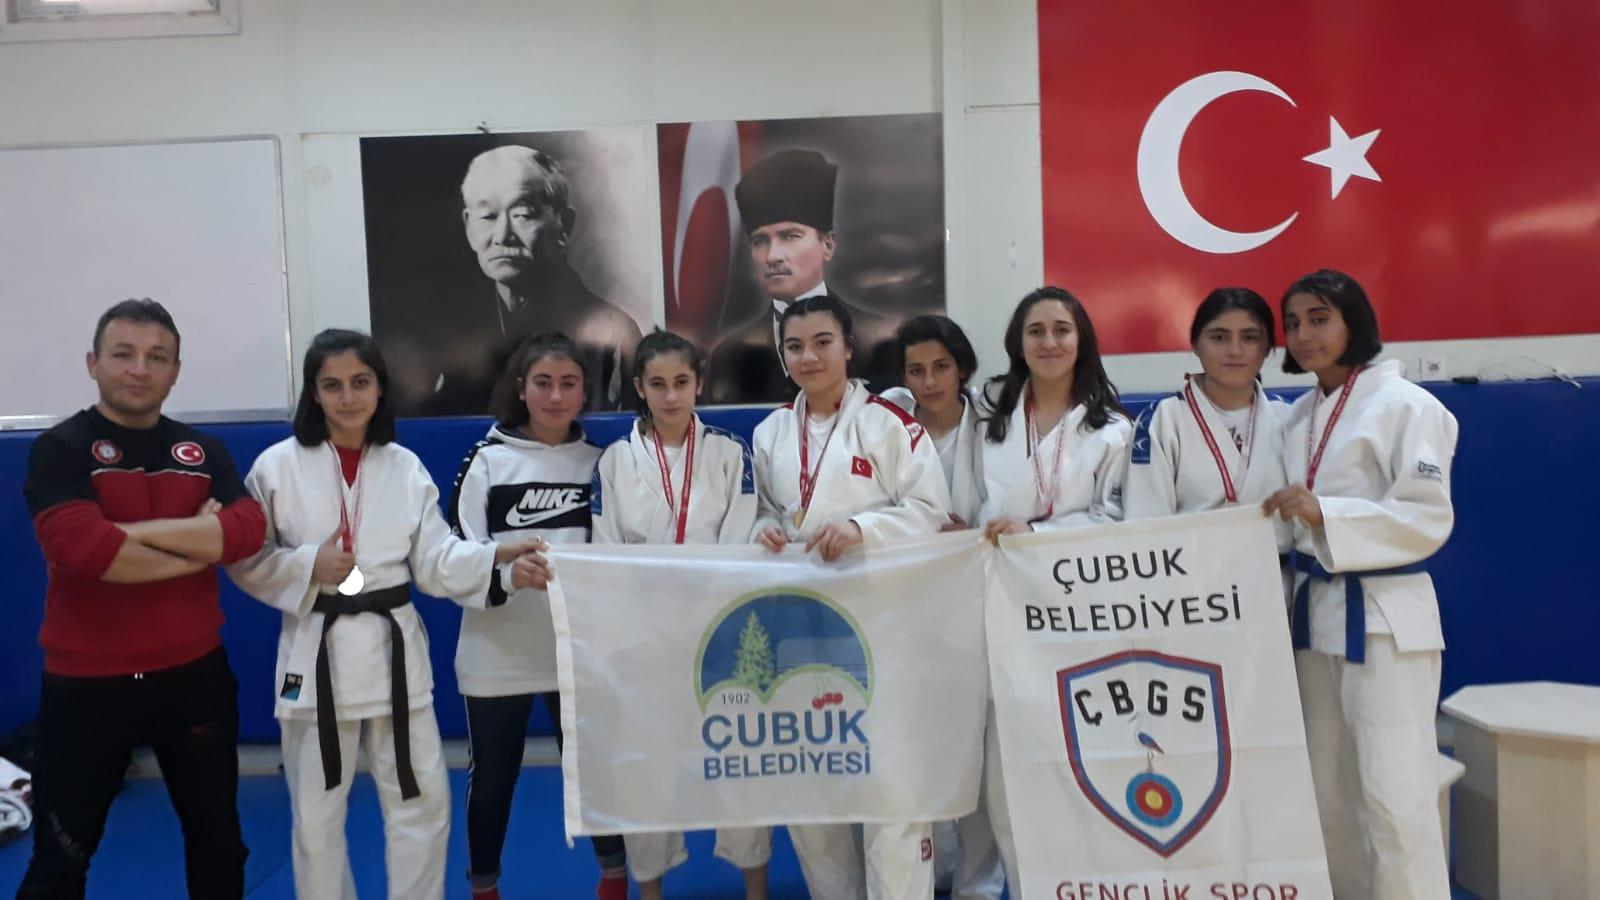 Çubuklu Judoculardan 12 Madalya